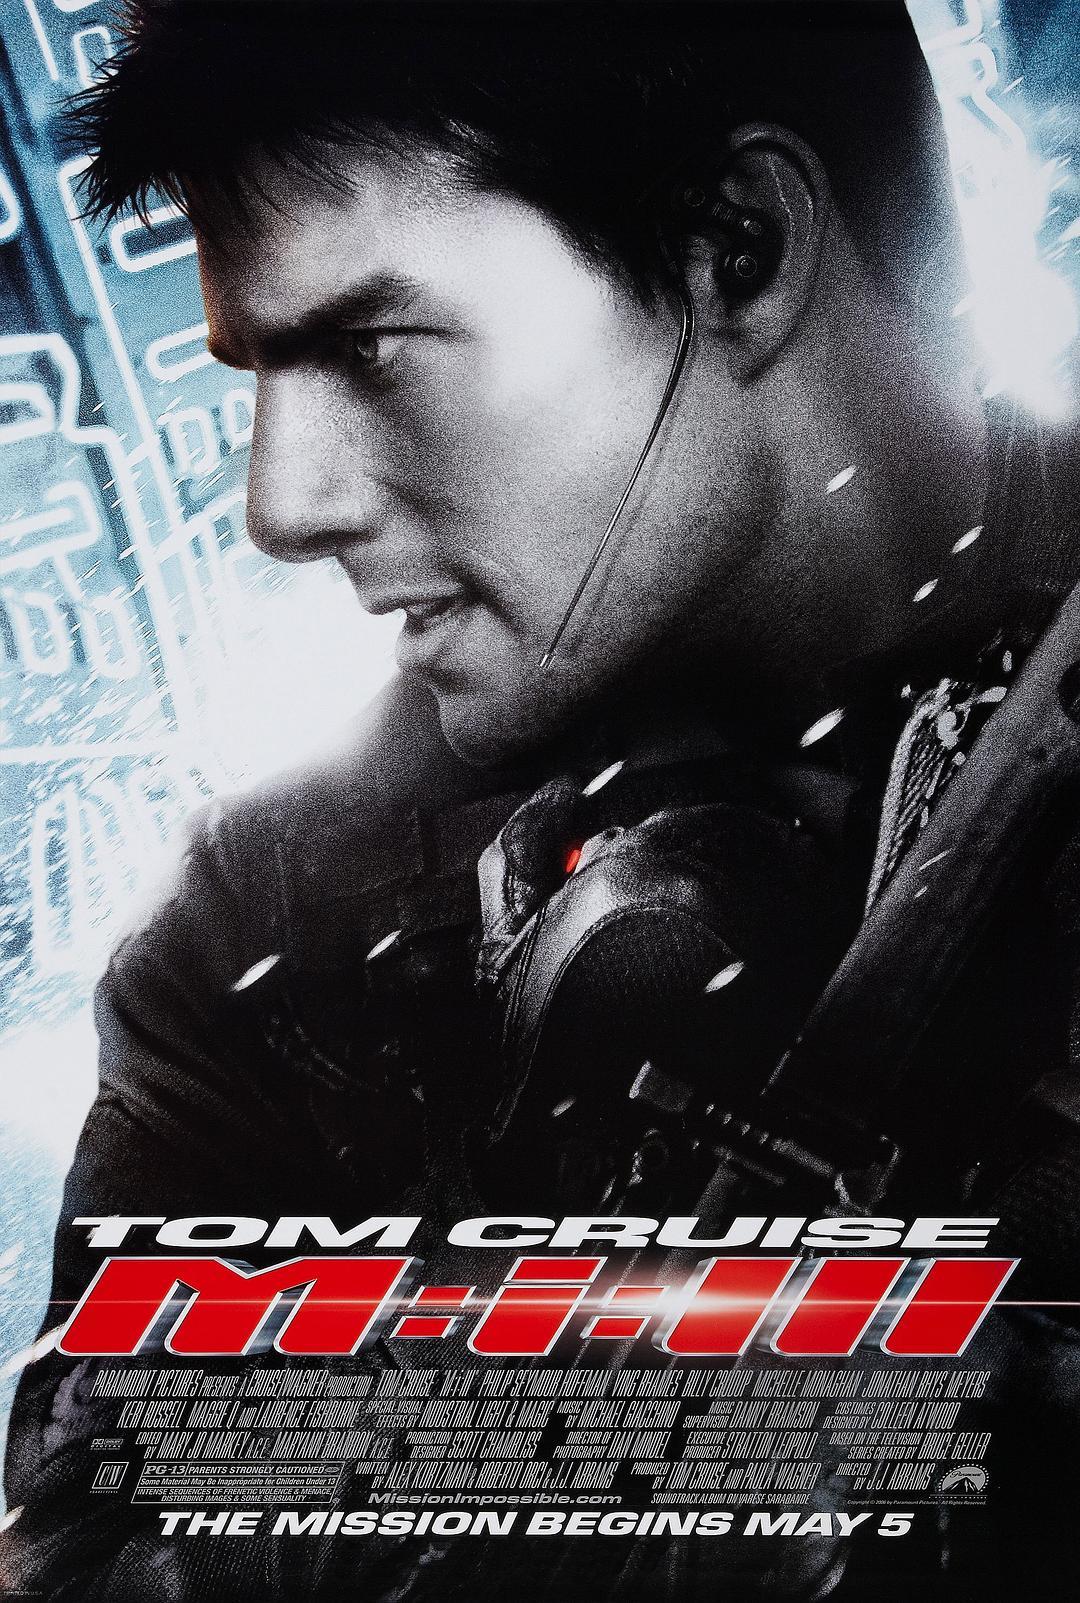 碟中谍3 4K蓝光原盘下载+高清MKV版 / M: I 3 / 不可能的任务3(台) / 职业特工队3(港) 2006 Mission: Impossible III 60.1G